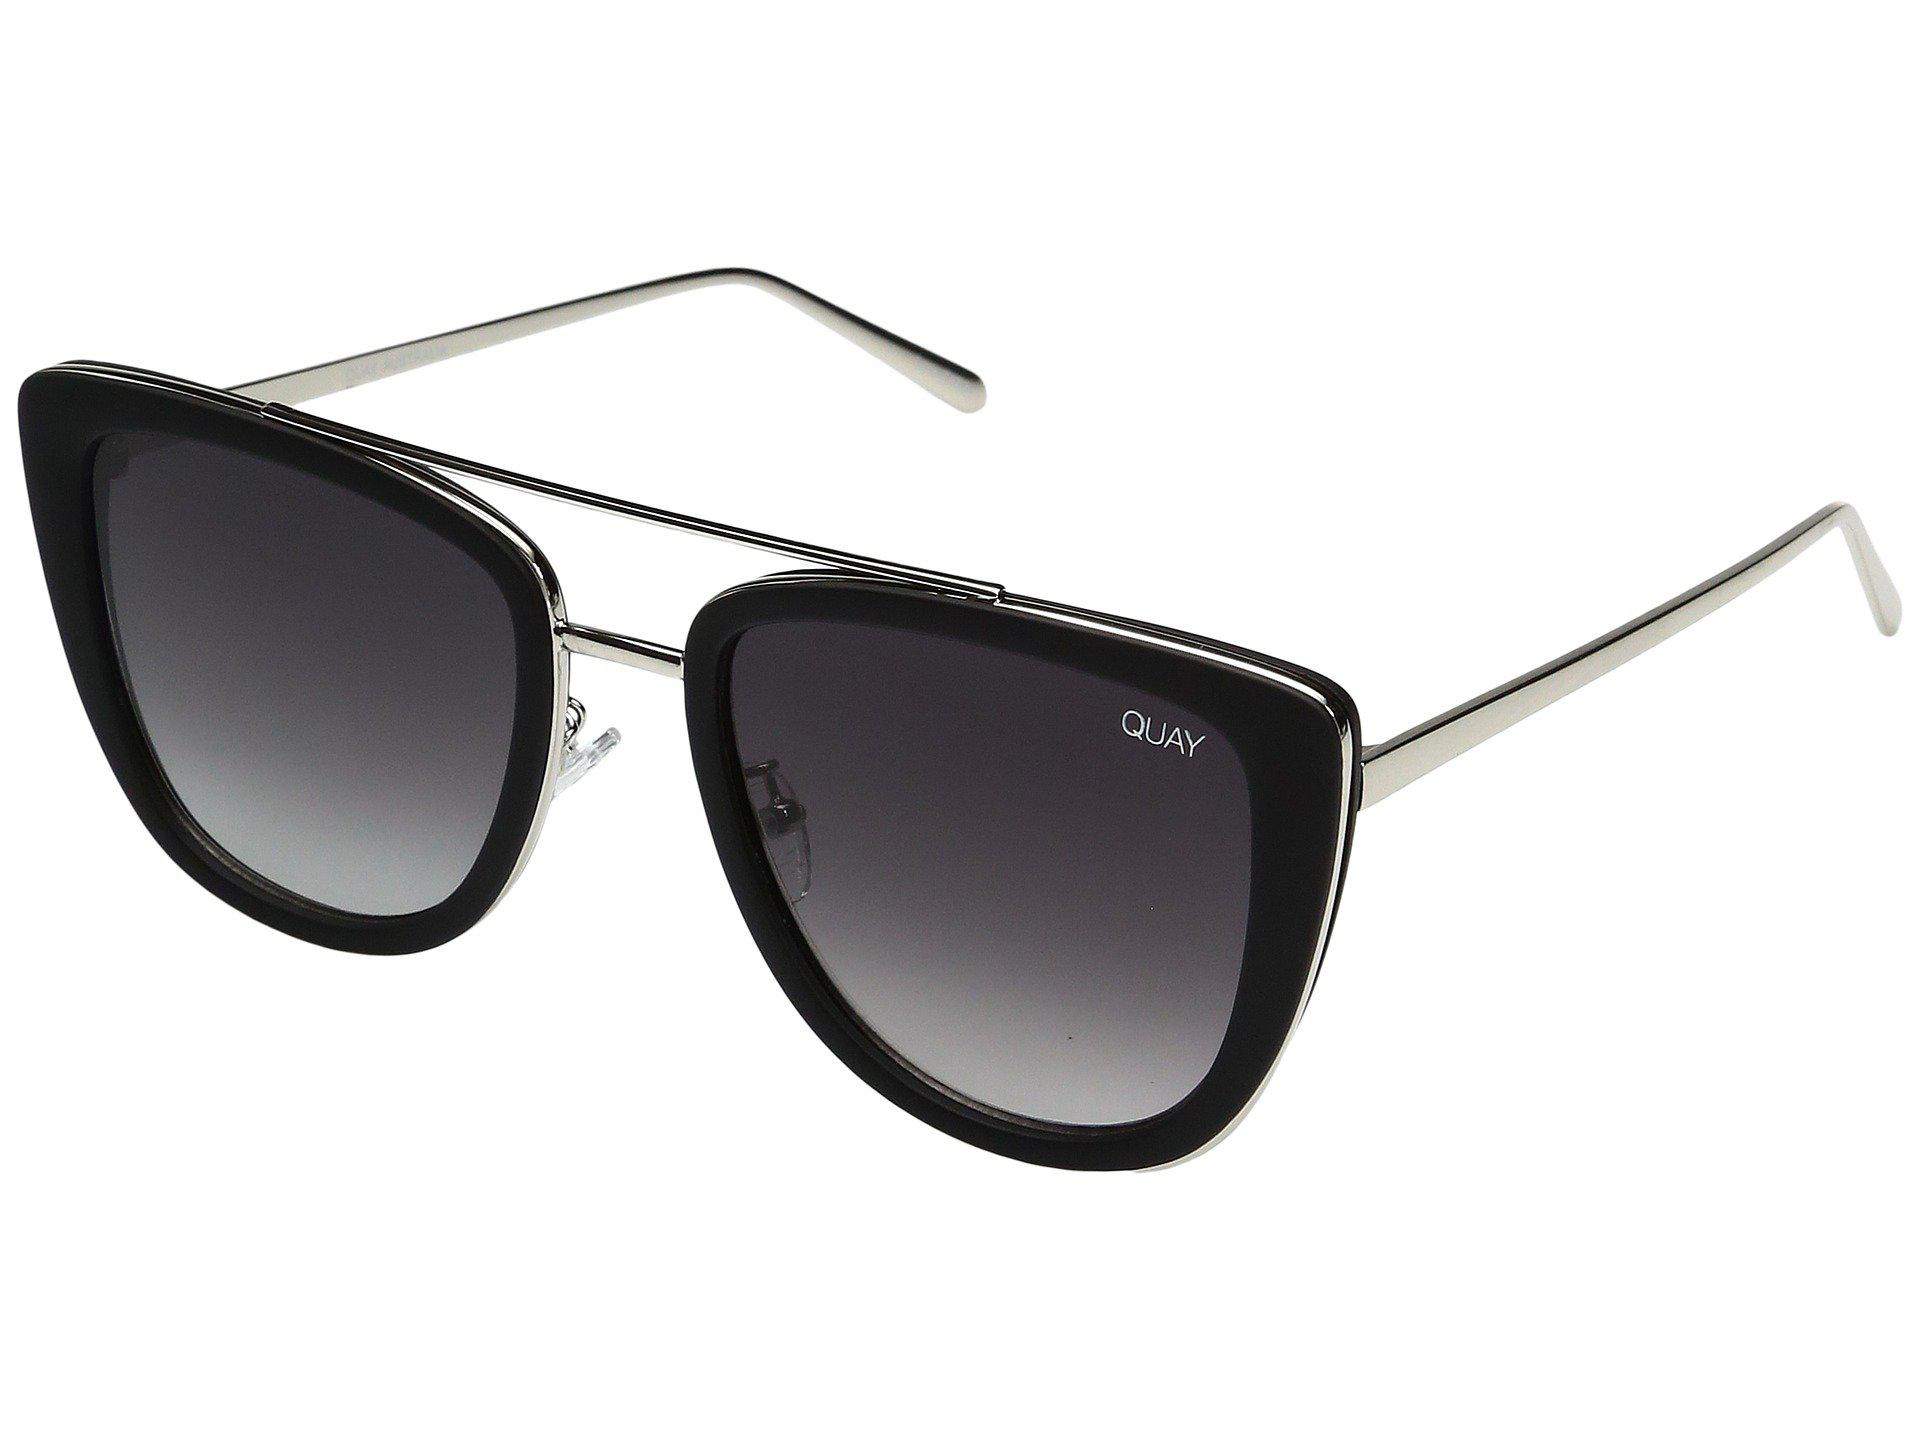 430f330182e70 Quay - Black French Kiss (tort gold) Fashion Sunglasses - Lyst. View  fullscreen